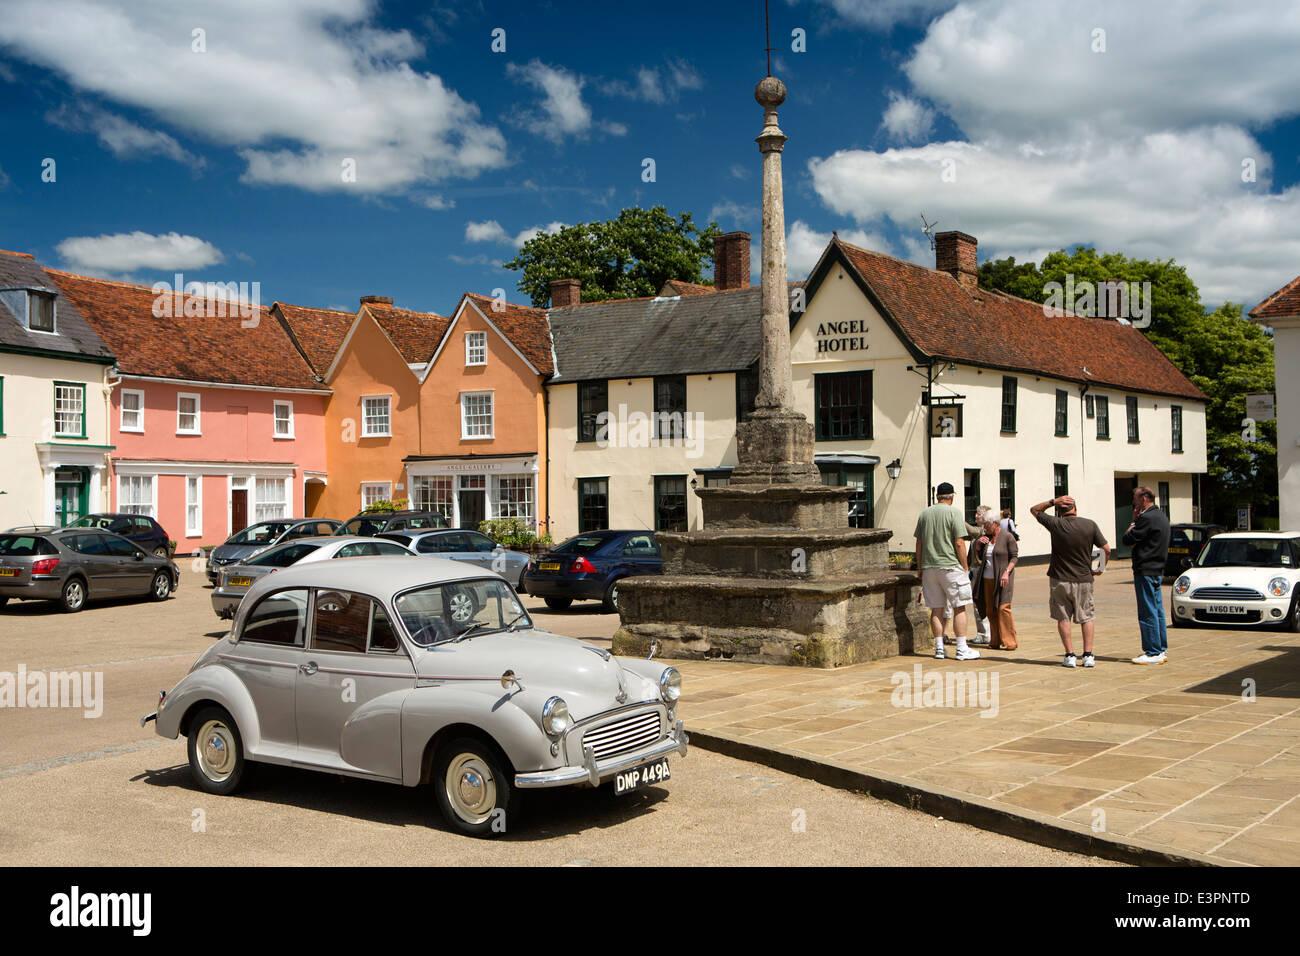 UK England, Suffolk, Lavenham, Market Square, Marco Pierre White's Angel Hotel - Stock Image